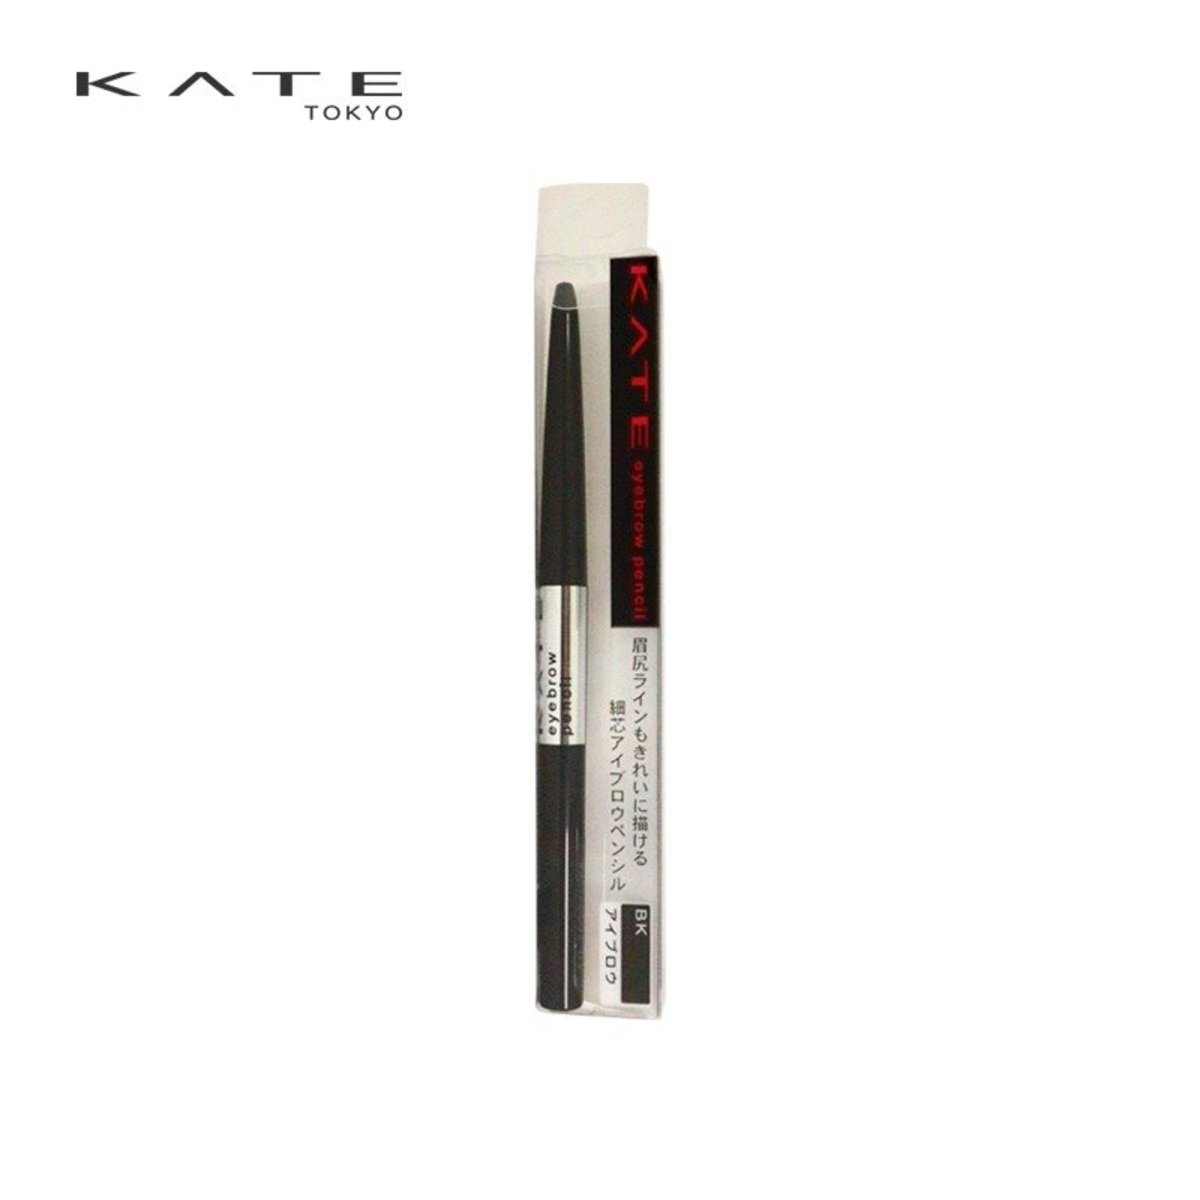 KATE 超細芯旋轉自動免削眉筆 - BR-3天然棕色   [平行進口產品]